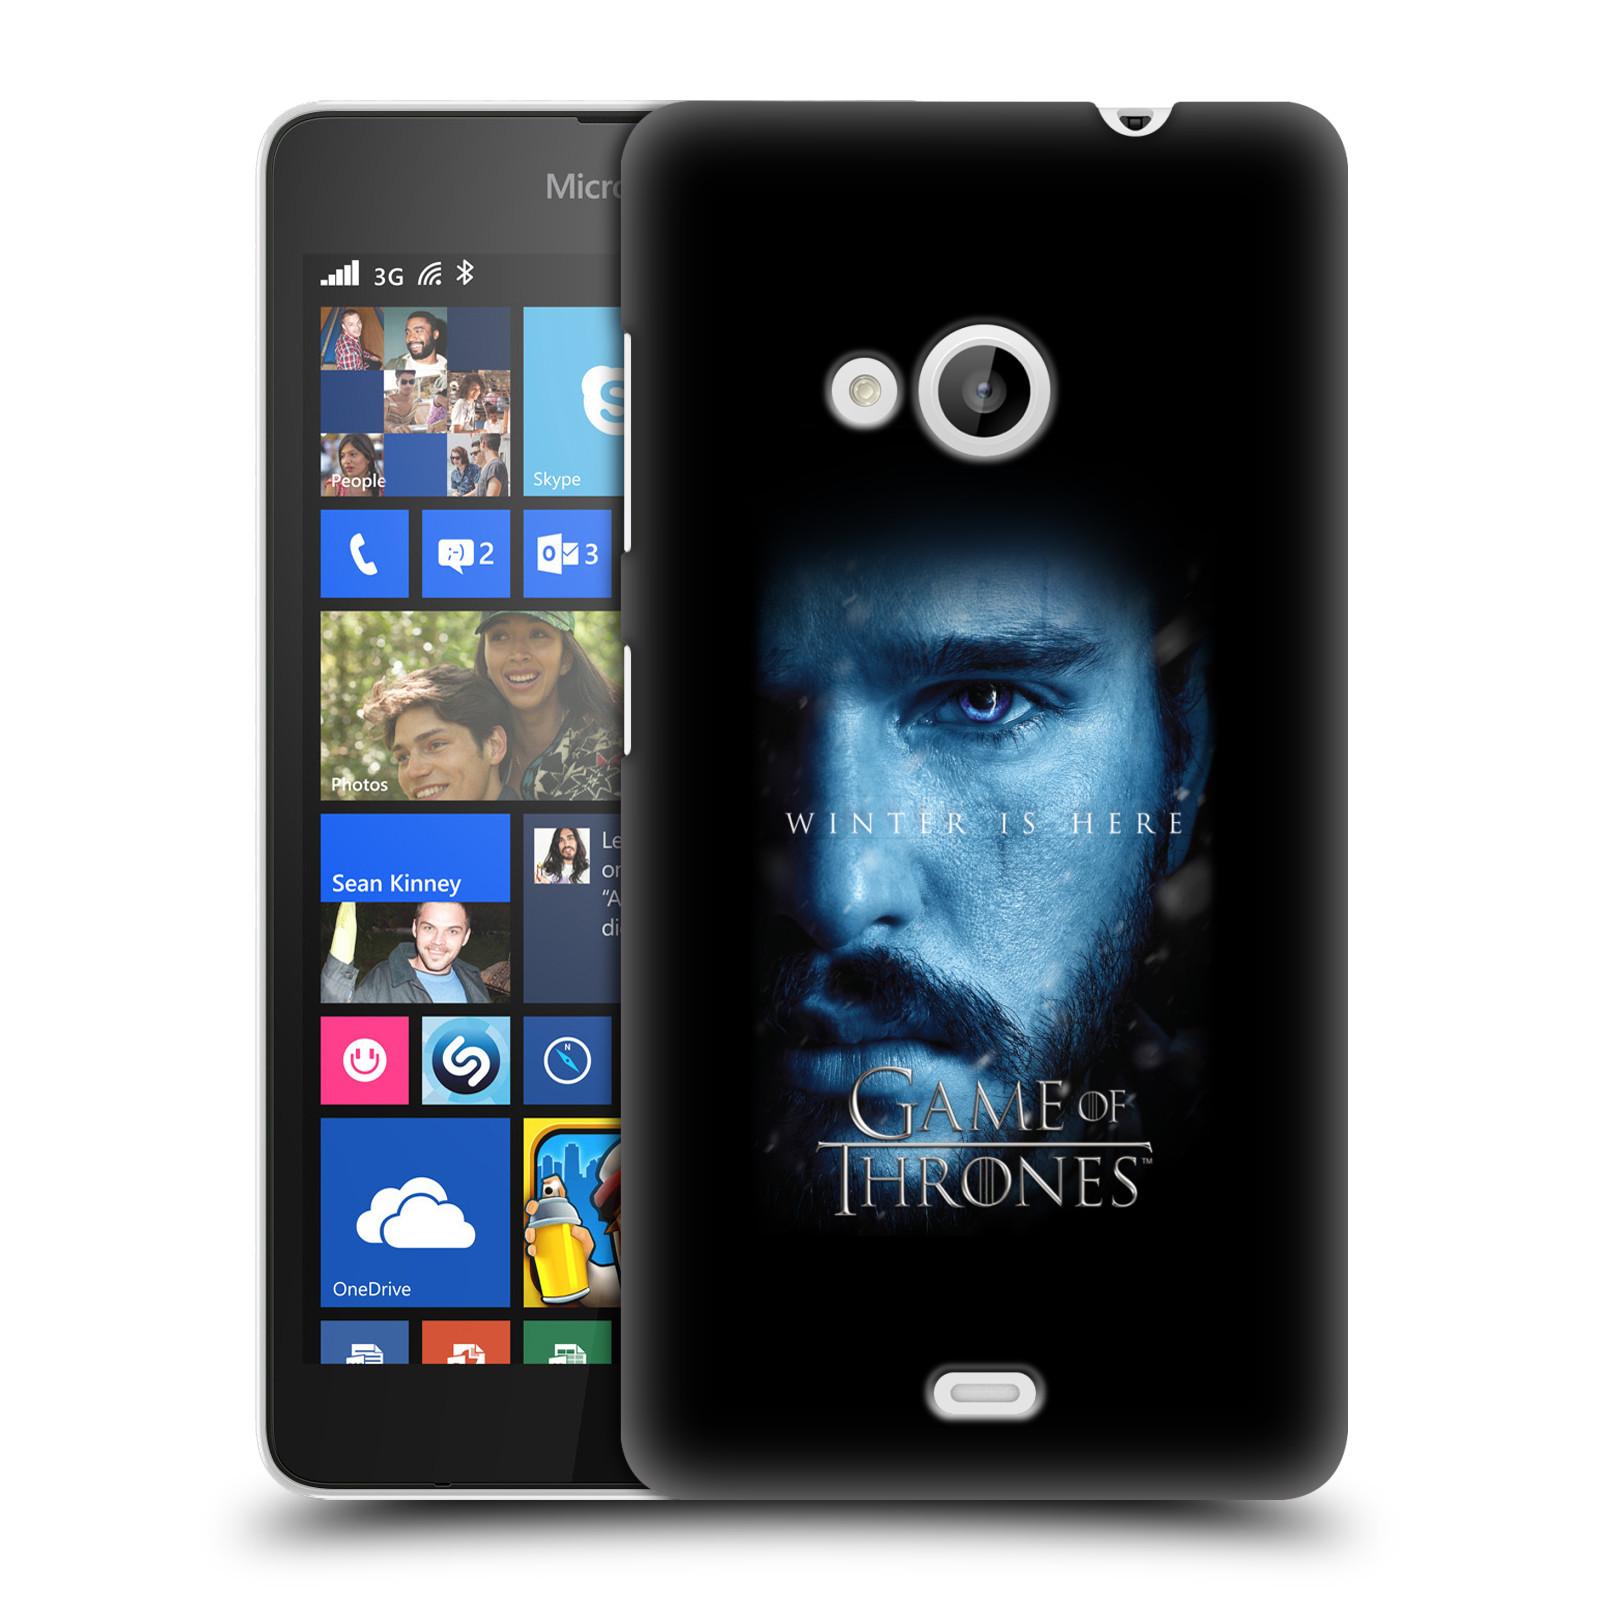 Plastové pouzdro na mobil Microsoft Lumia 535 - Head Case - Hra o trůny - Jon Snow - Winter is here (Plastový kryt či obal na mobilní telefon s motivem Game of Thrones - Jon Snow - Winter is here - Season 7 pro Microsoft Lumia 535)